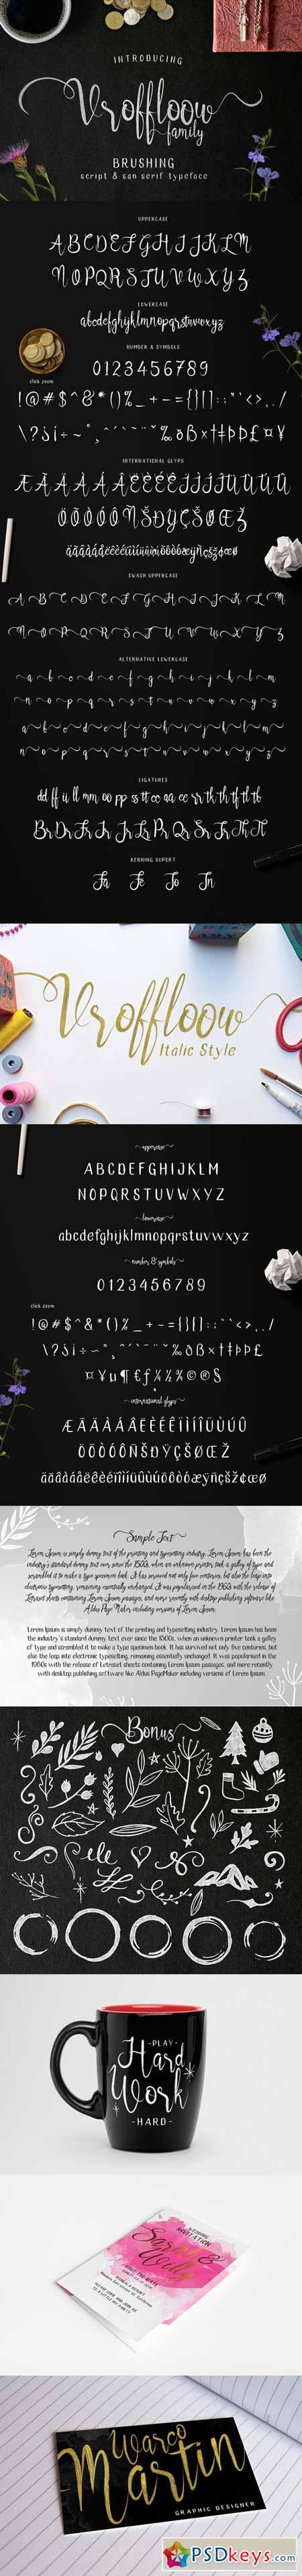 Vroffloow family Typeface 392582